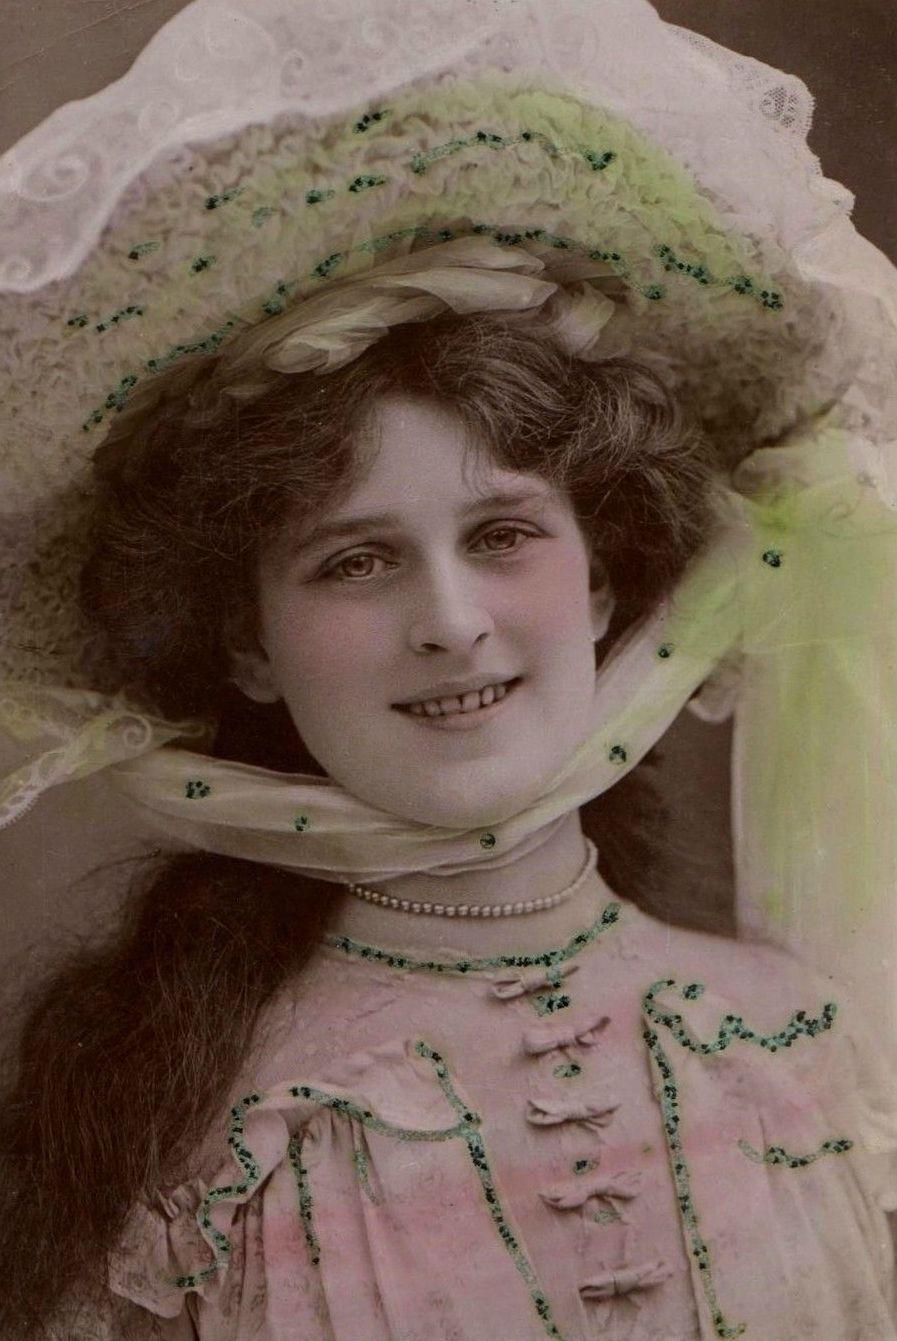 Oviya Helen,Joan Weston roller derby XXX fotos Giuditta Rissone (1895?977),Sammi Kane Kraft